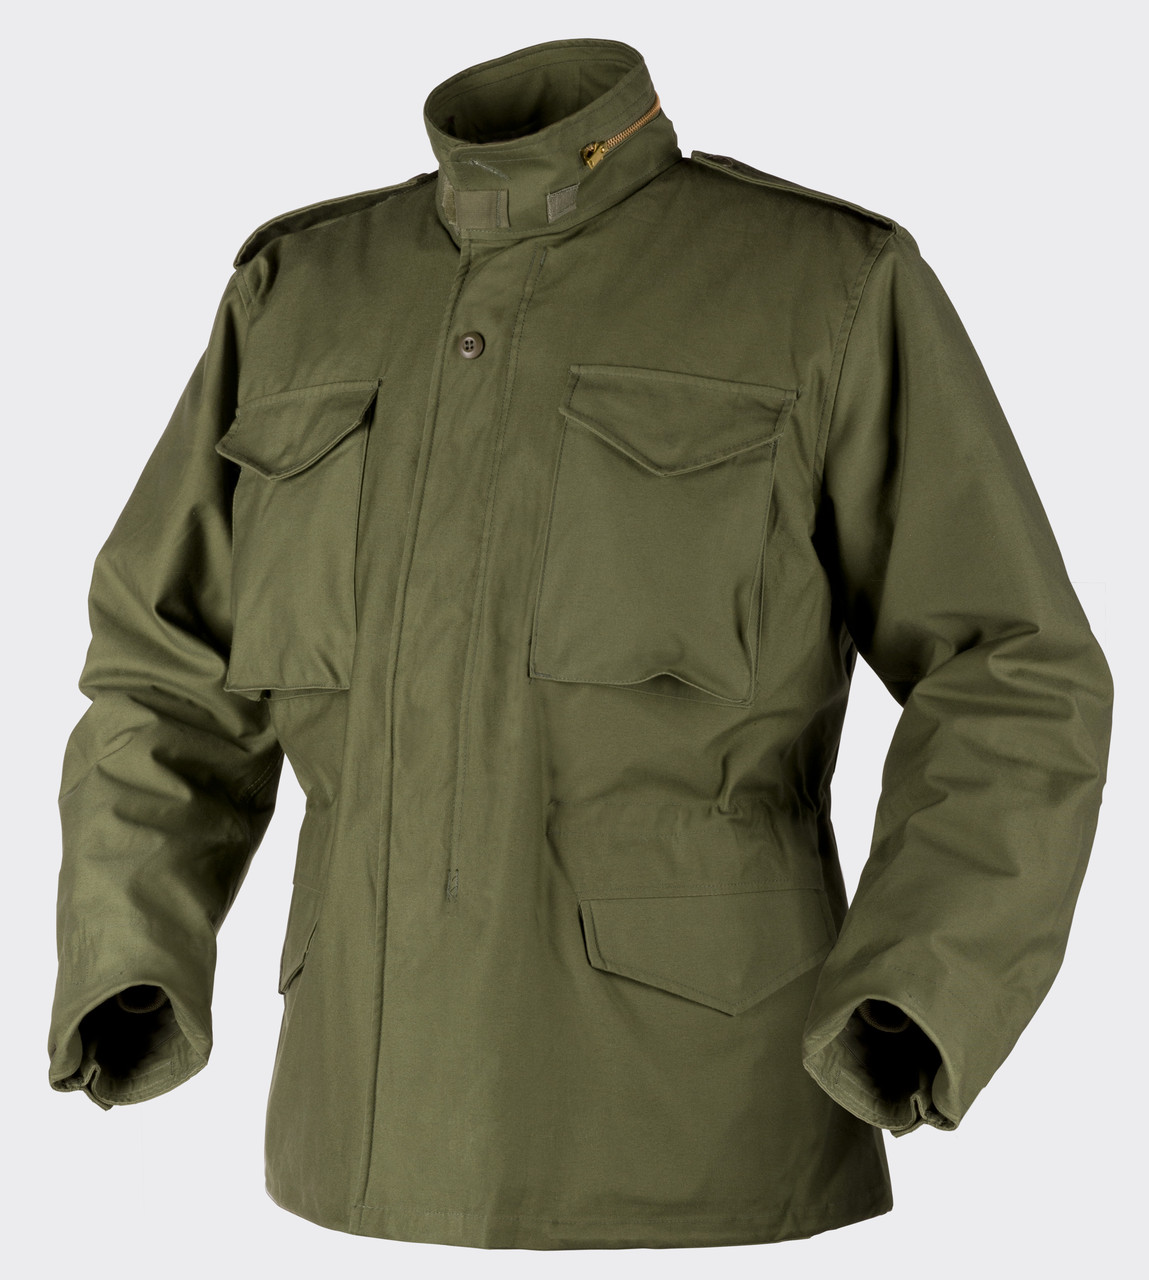 Куртка M65 - Nyco Sateen - олива